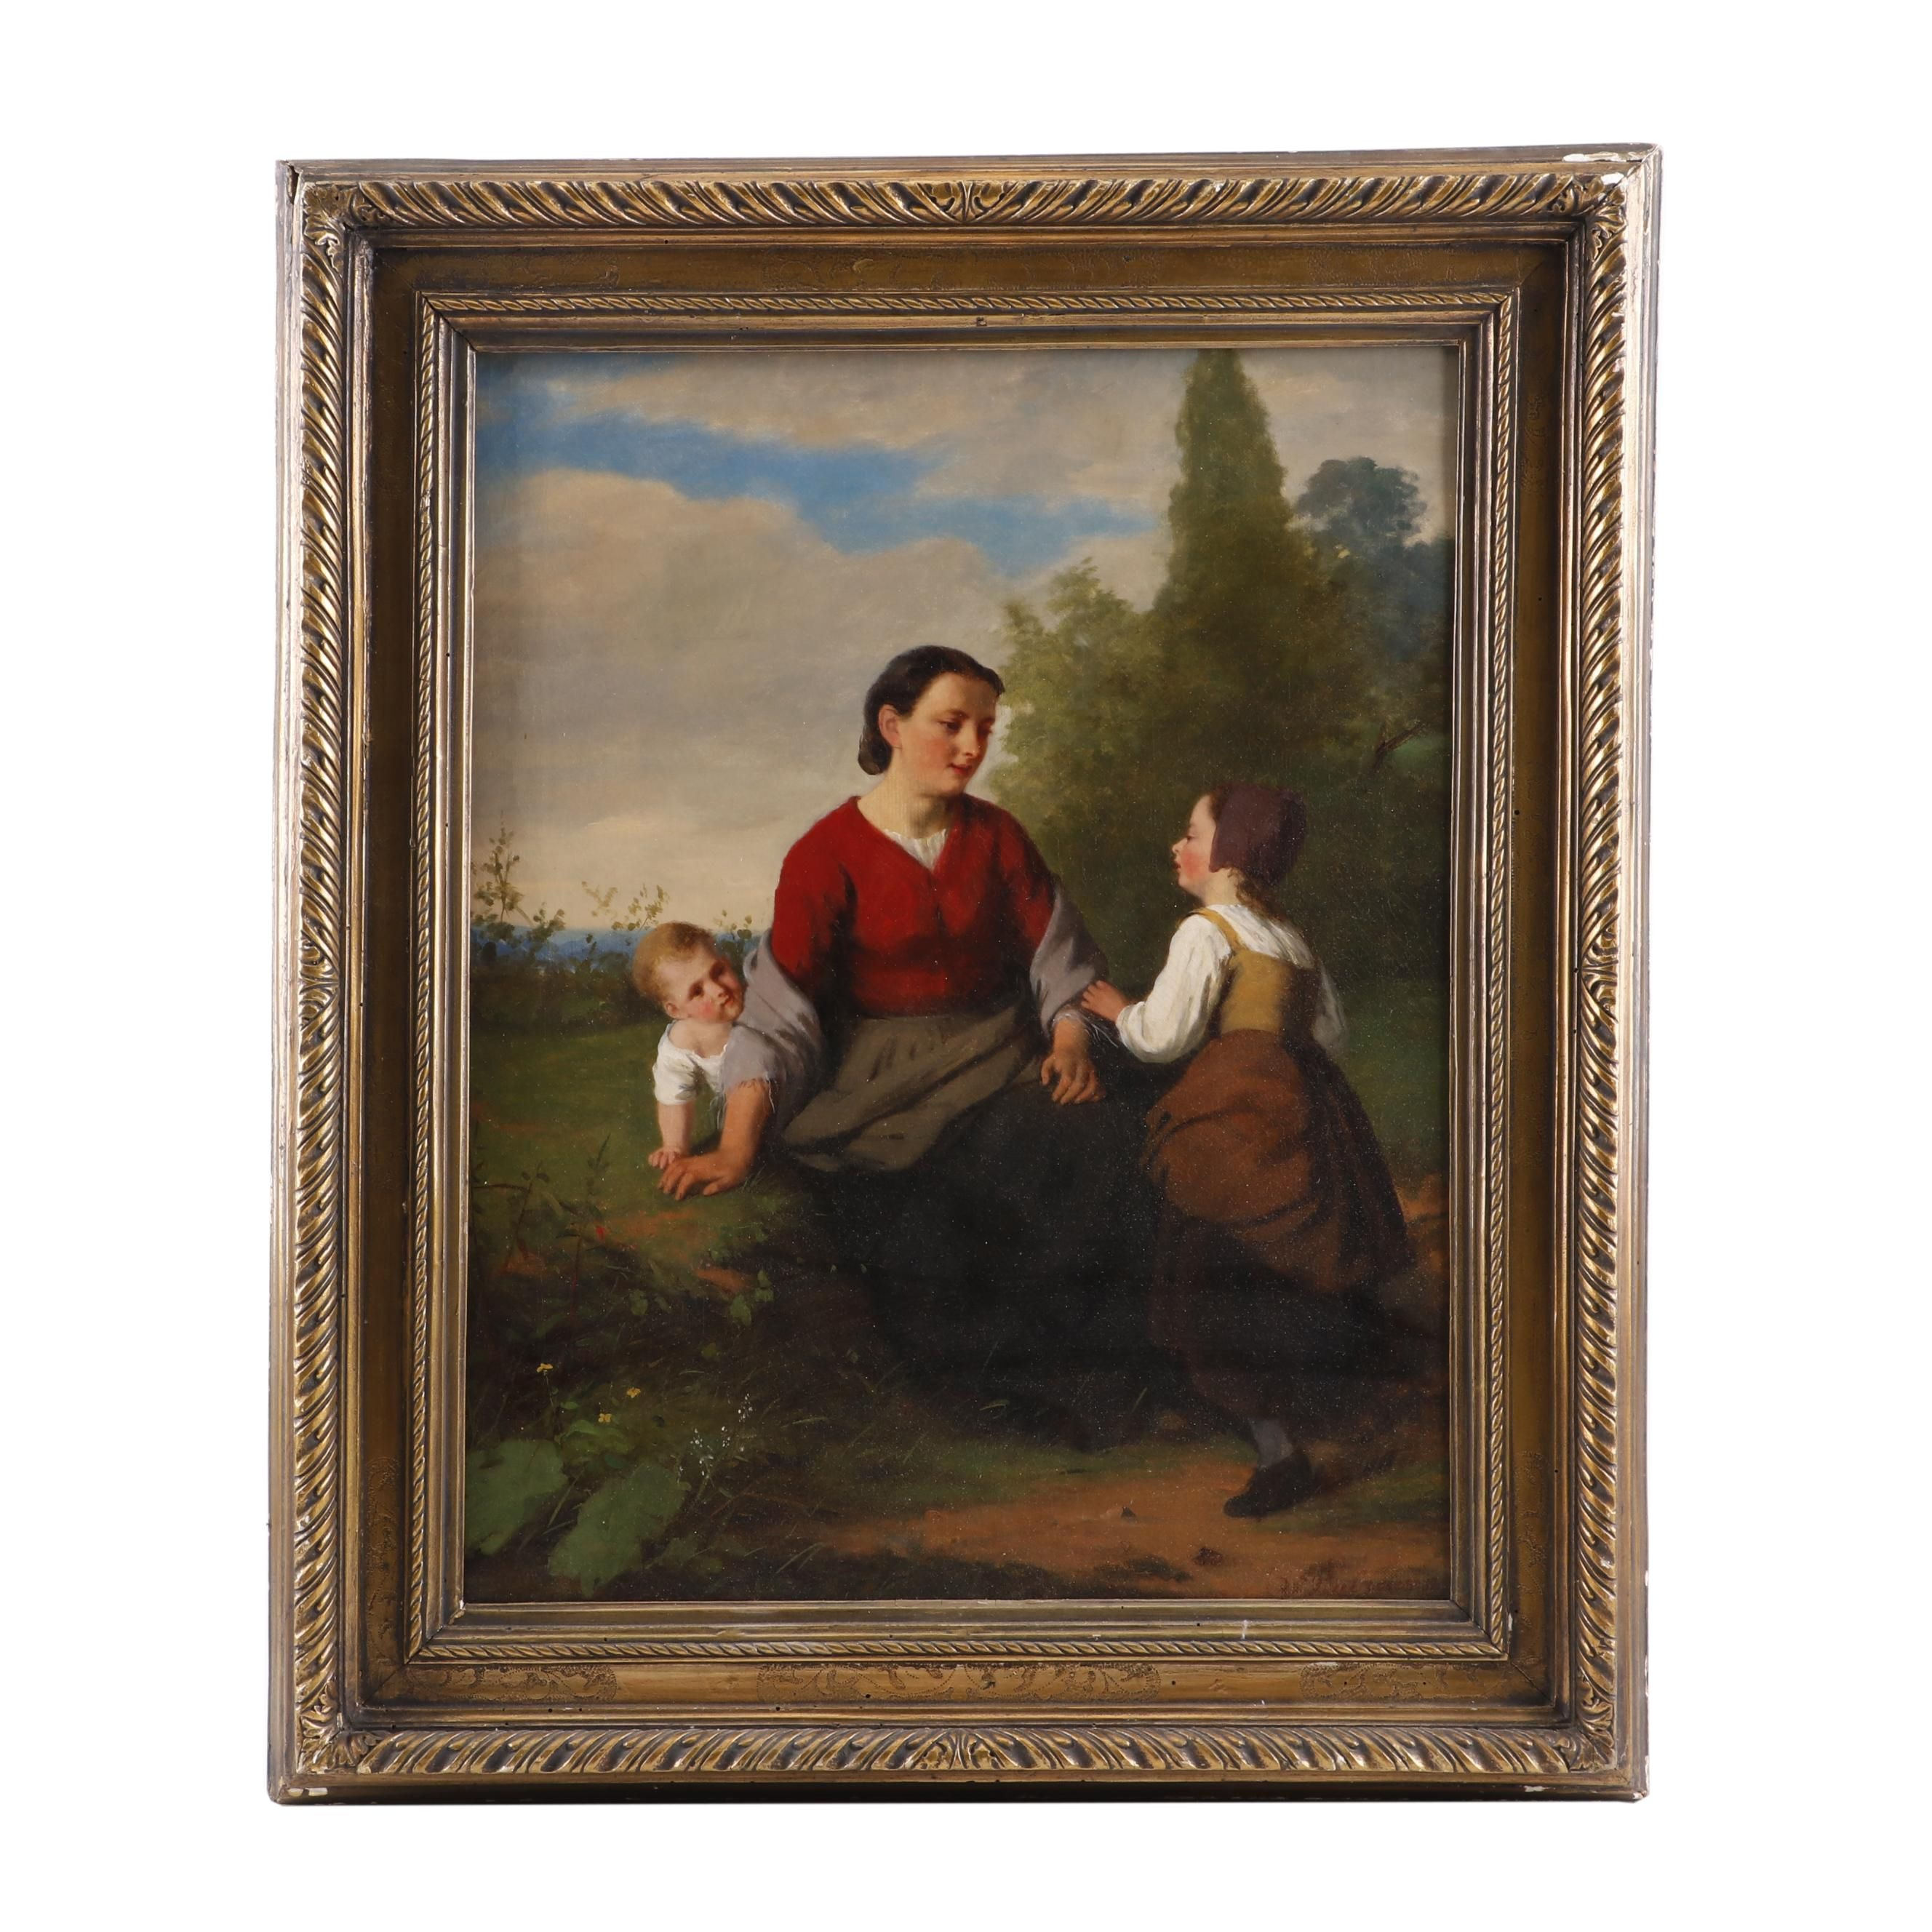 Jan Walraven Mid 19th Century Oil Painting